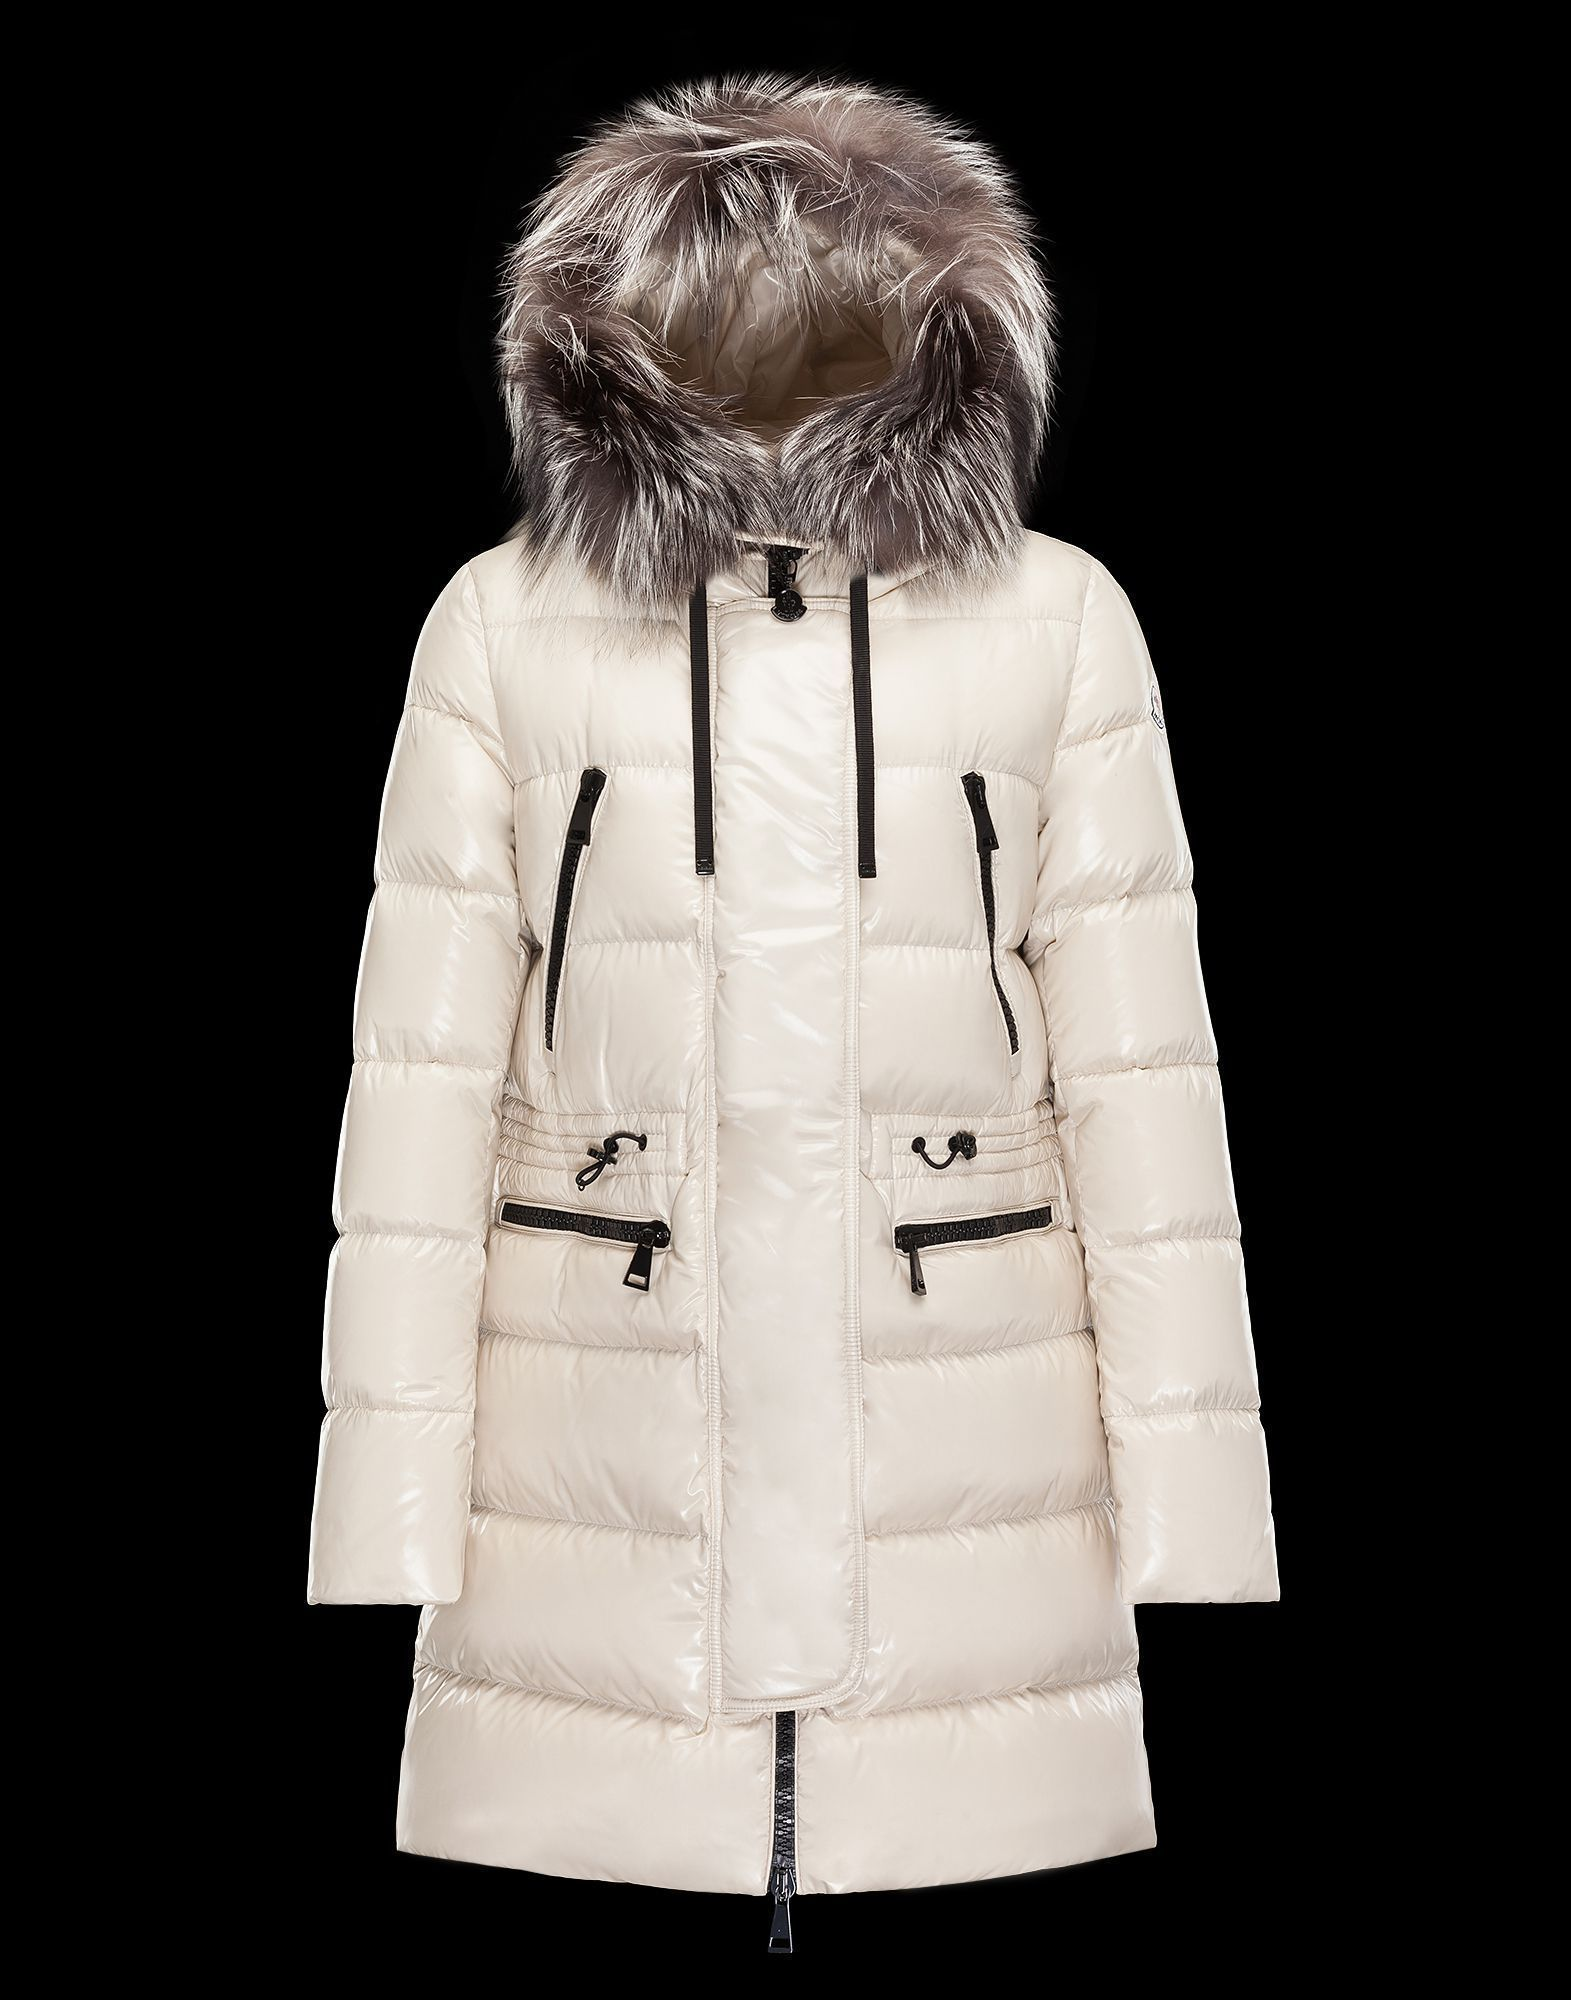 moncler jackets size 0